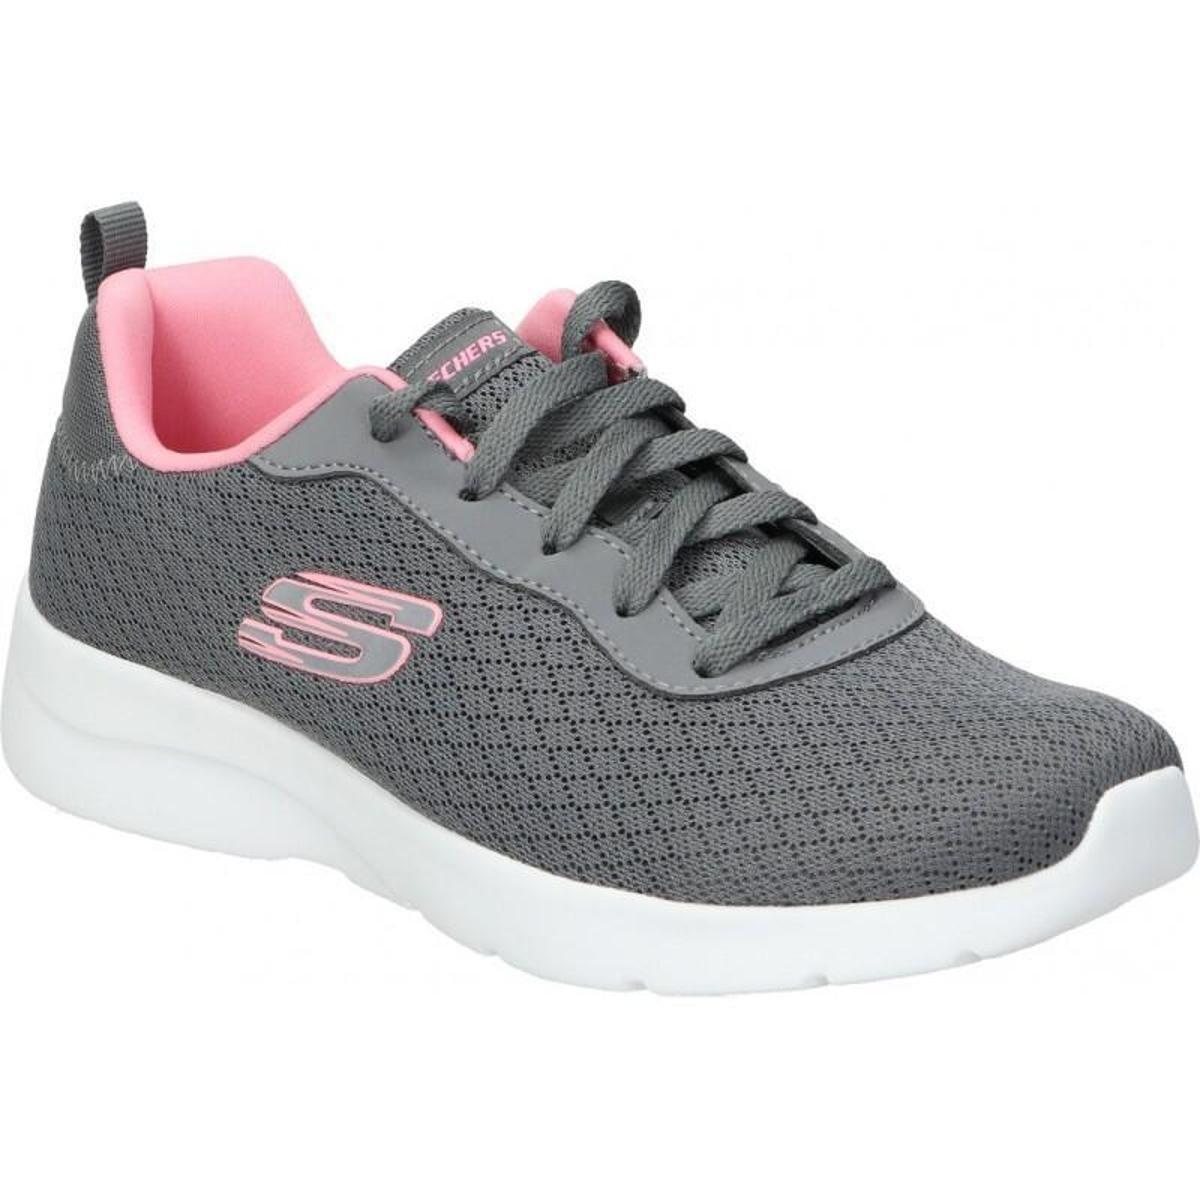 Tênis Skechers Dynamight 2.0 carvão/coral